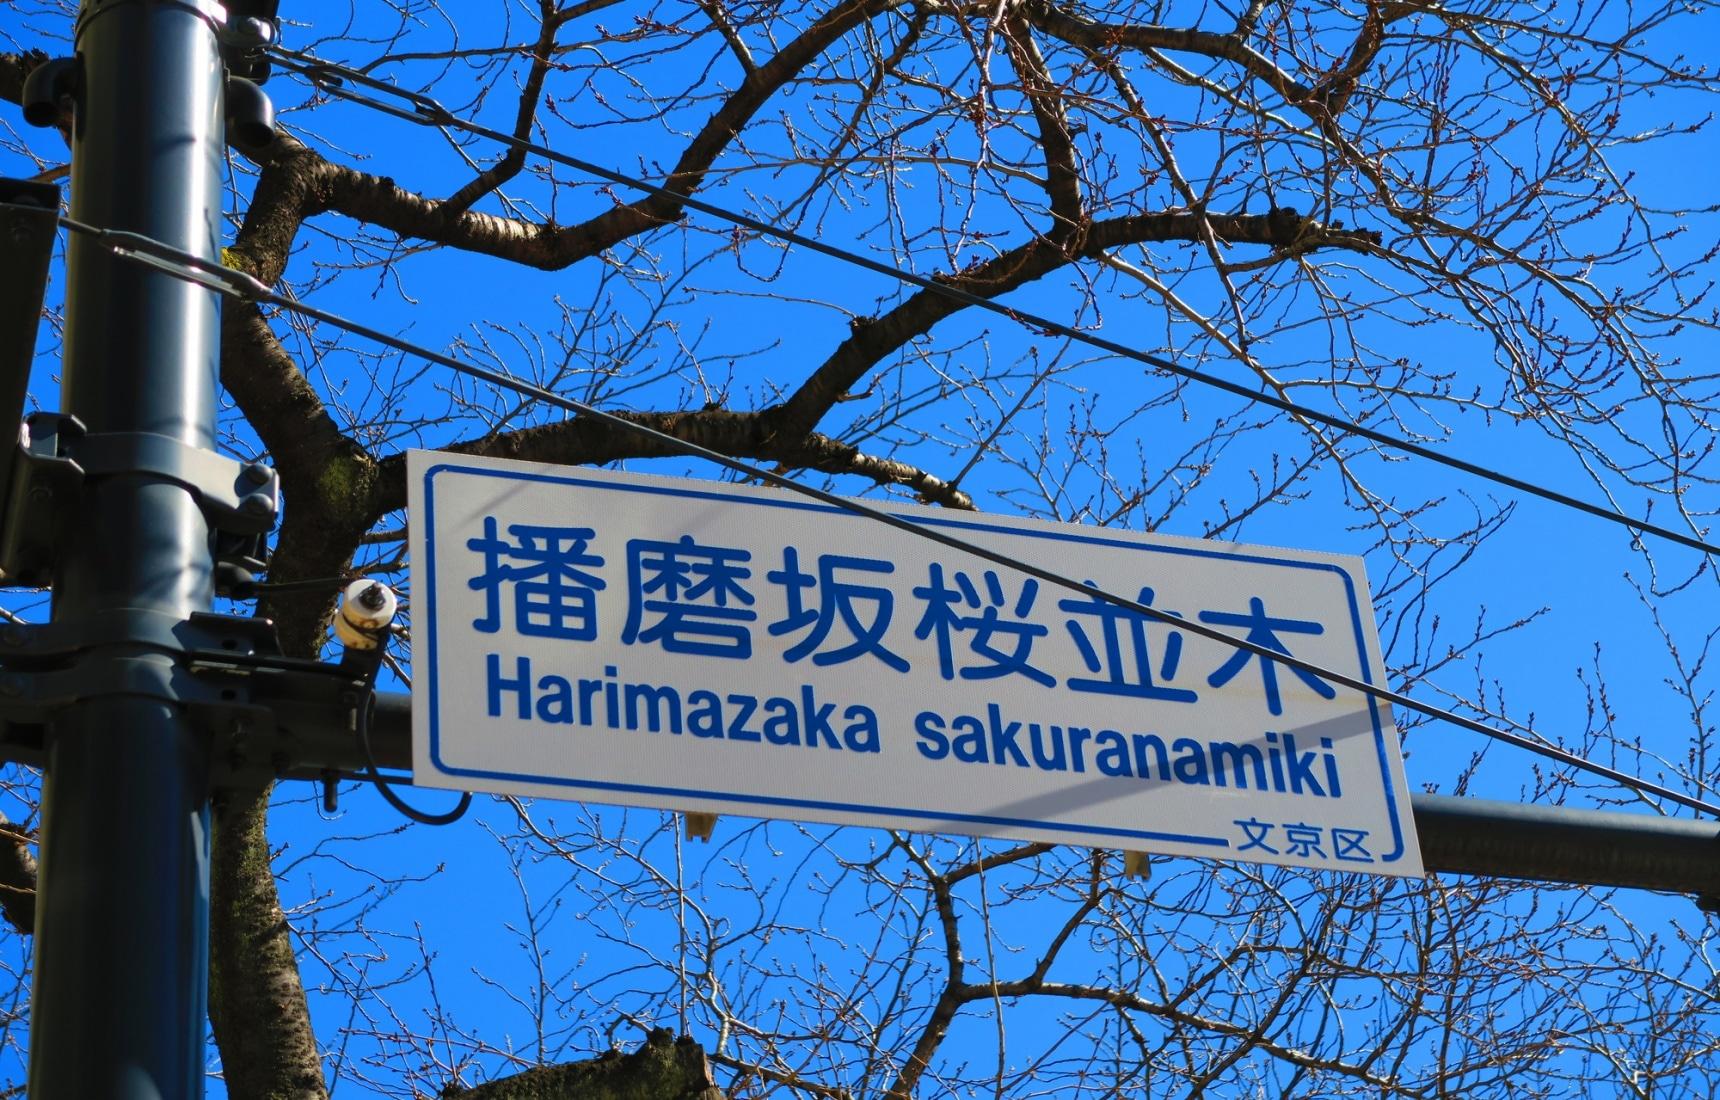 Harima Zaka: Tokyo Sakura without the Crowds!